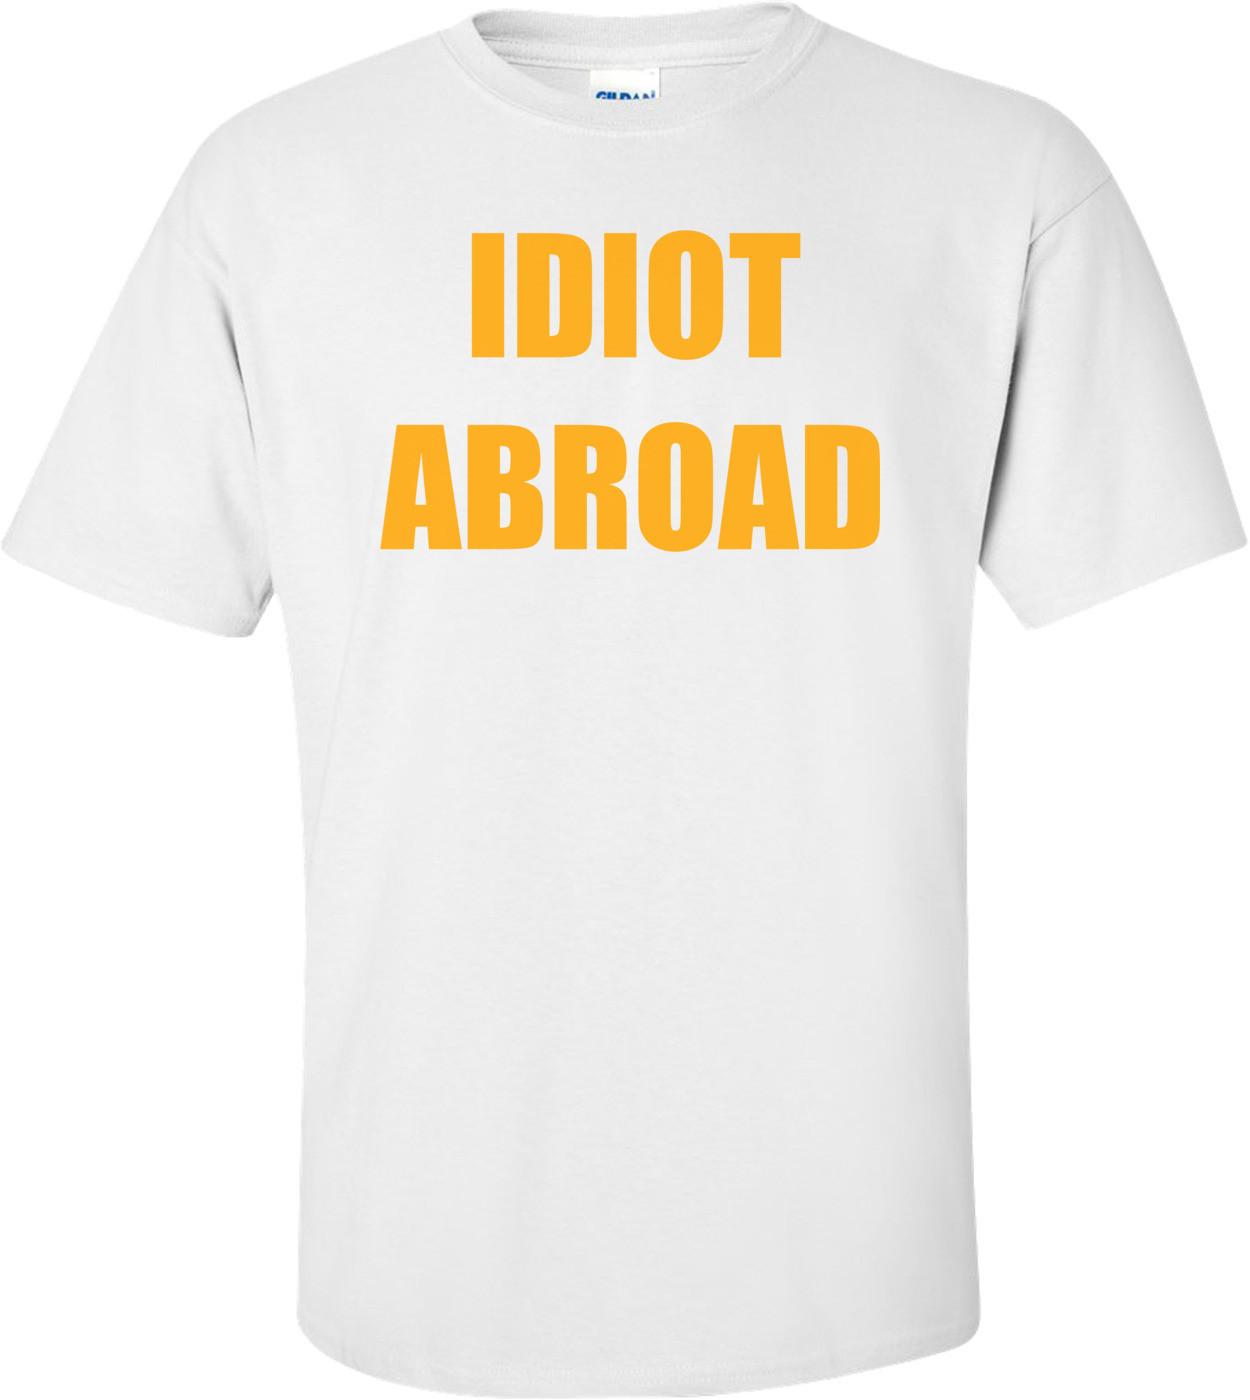 IDIOT ABROAD Shirt